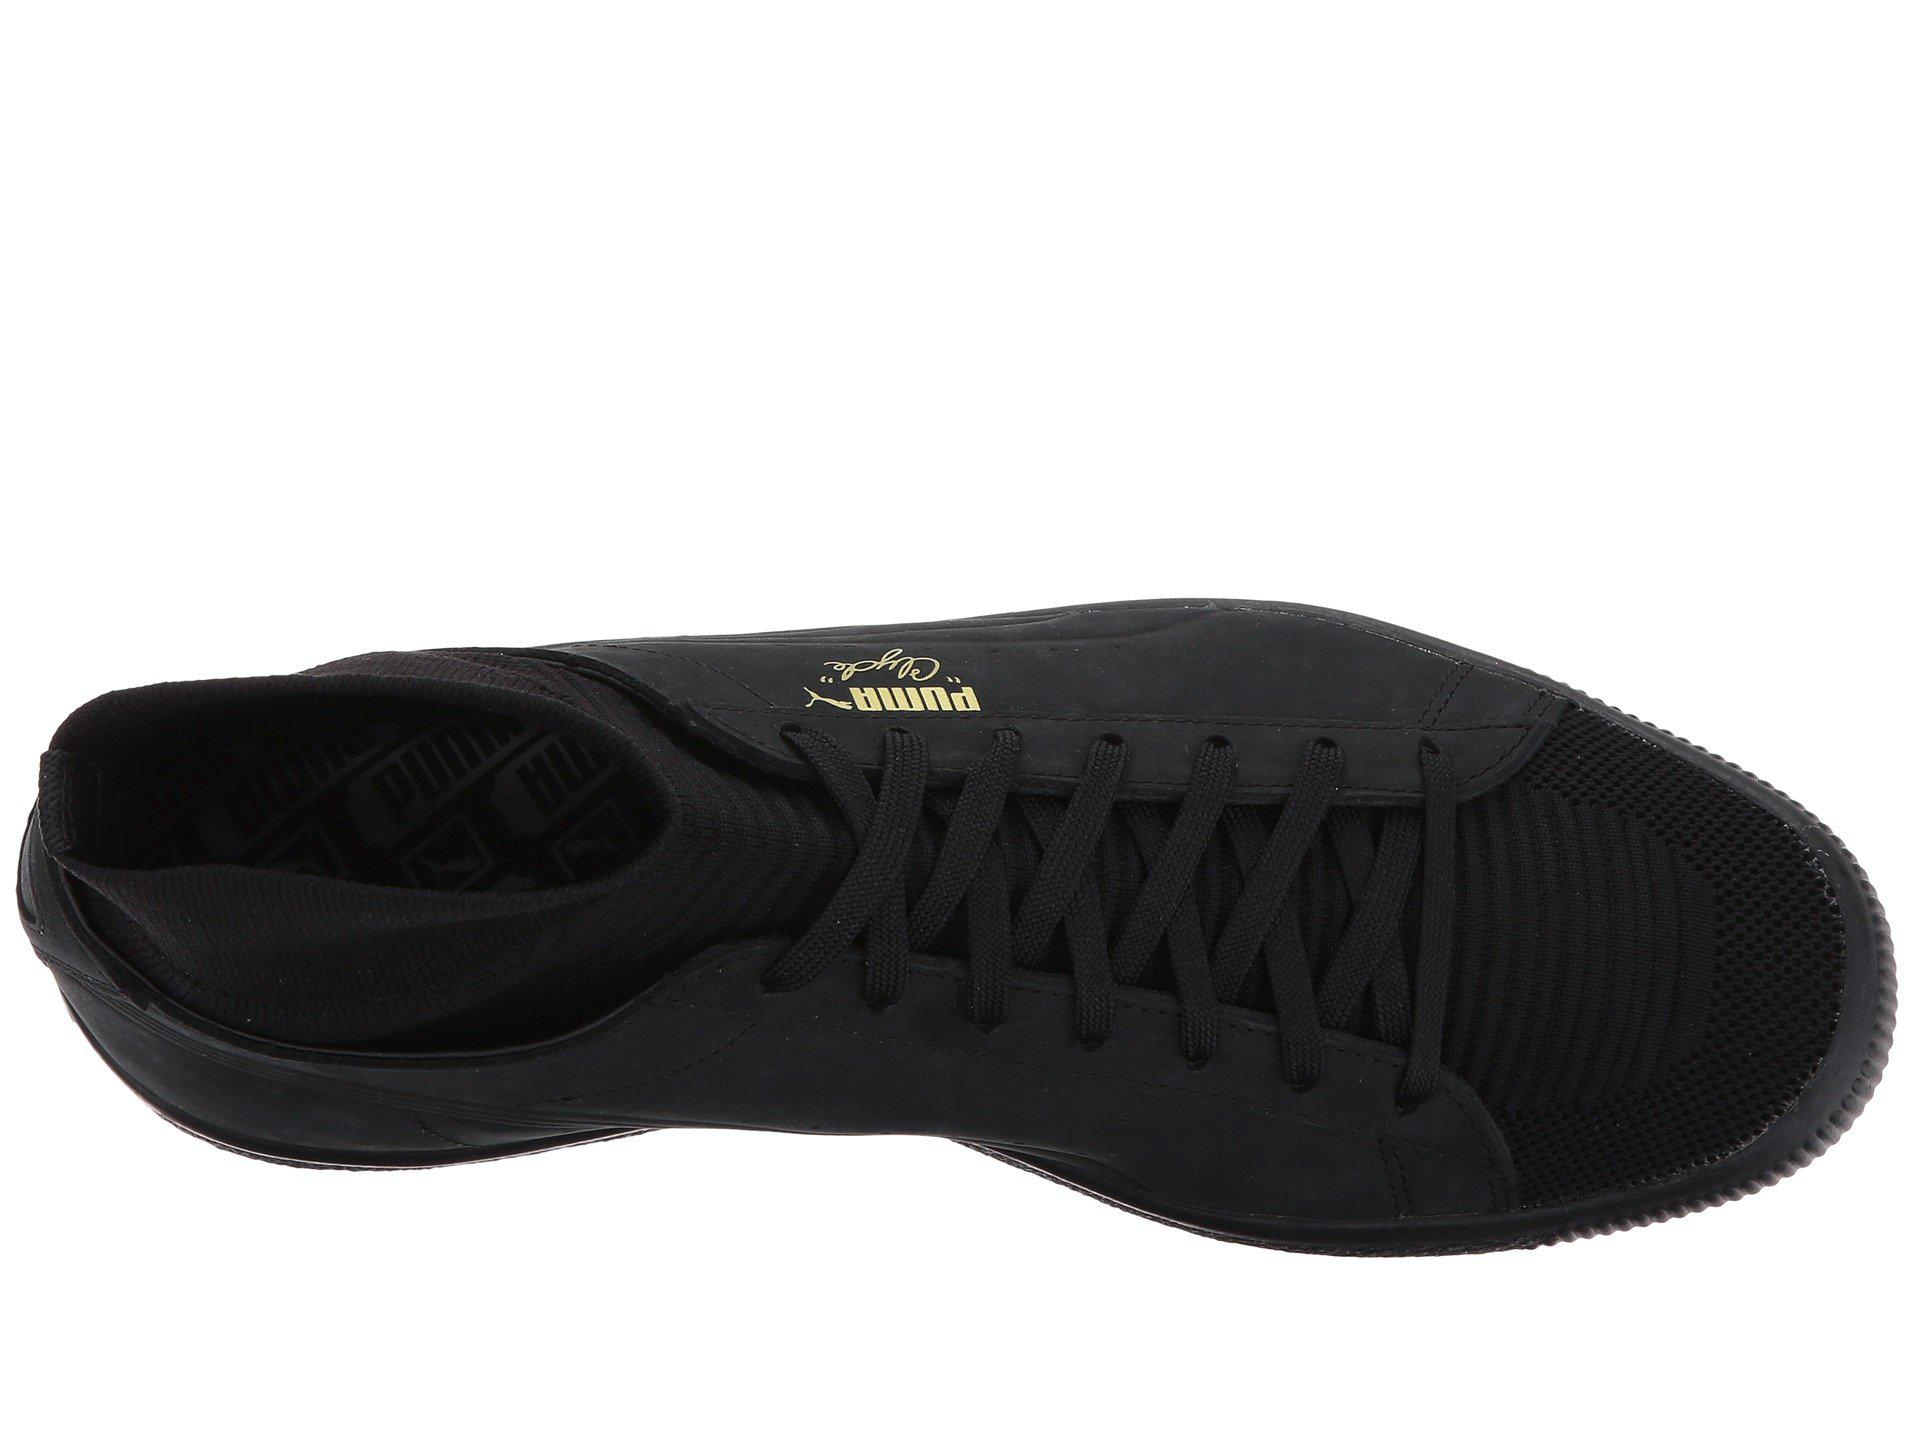 wholesale dealer 99a84 624ff PUMA - Black Clyde Sock Select for Men - Lyst. View fullscreen